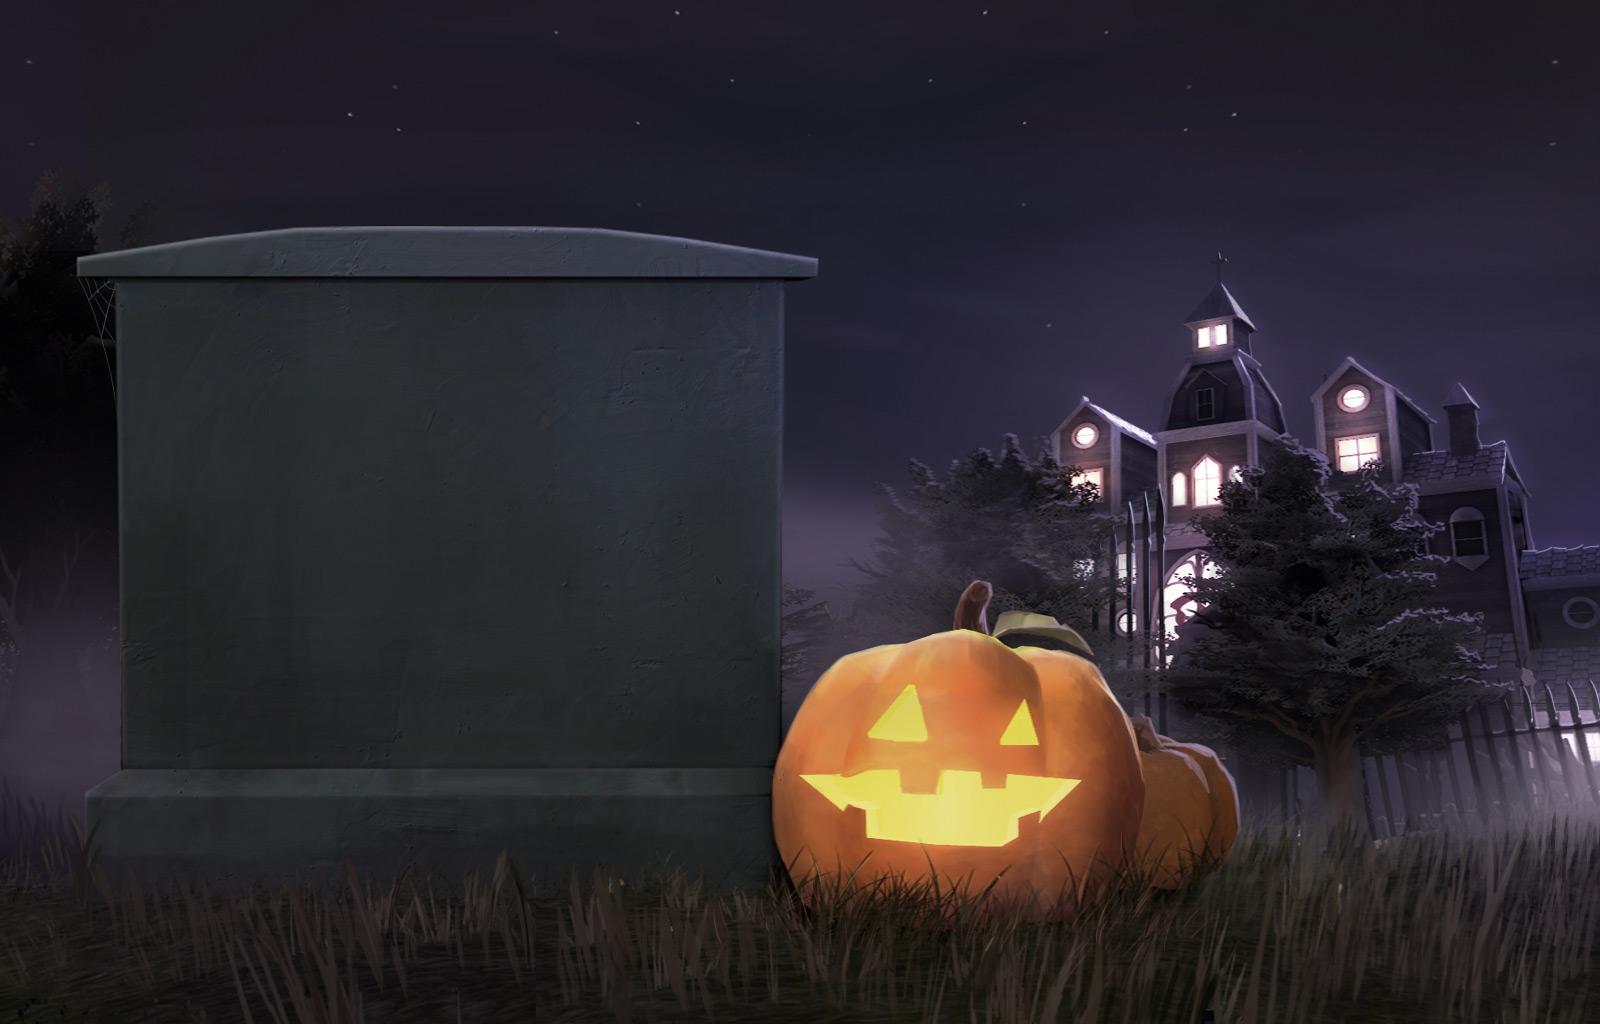 tf2 halloween wallpaper - photo #30